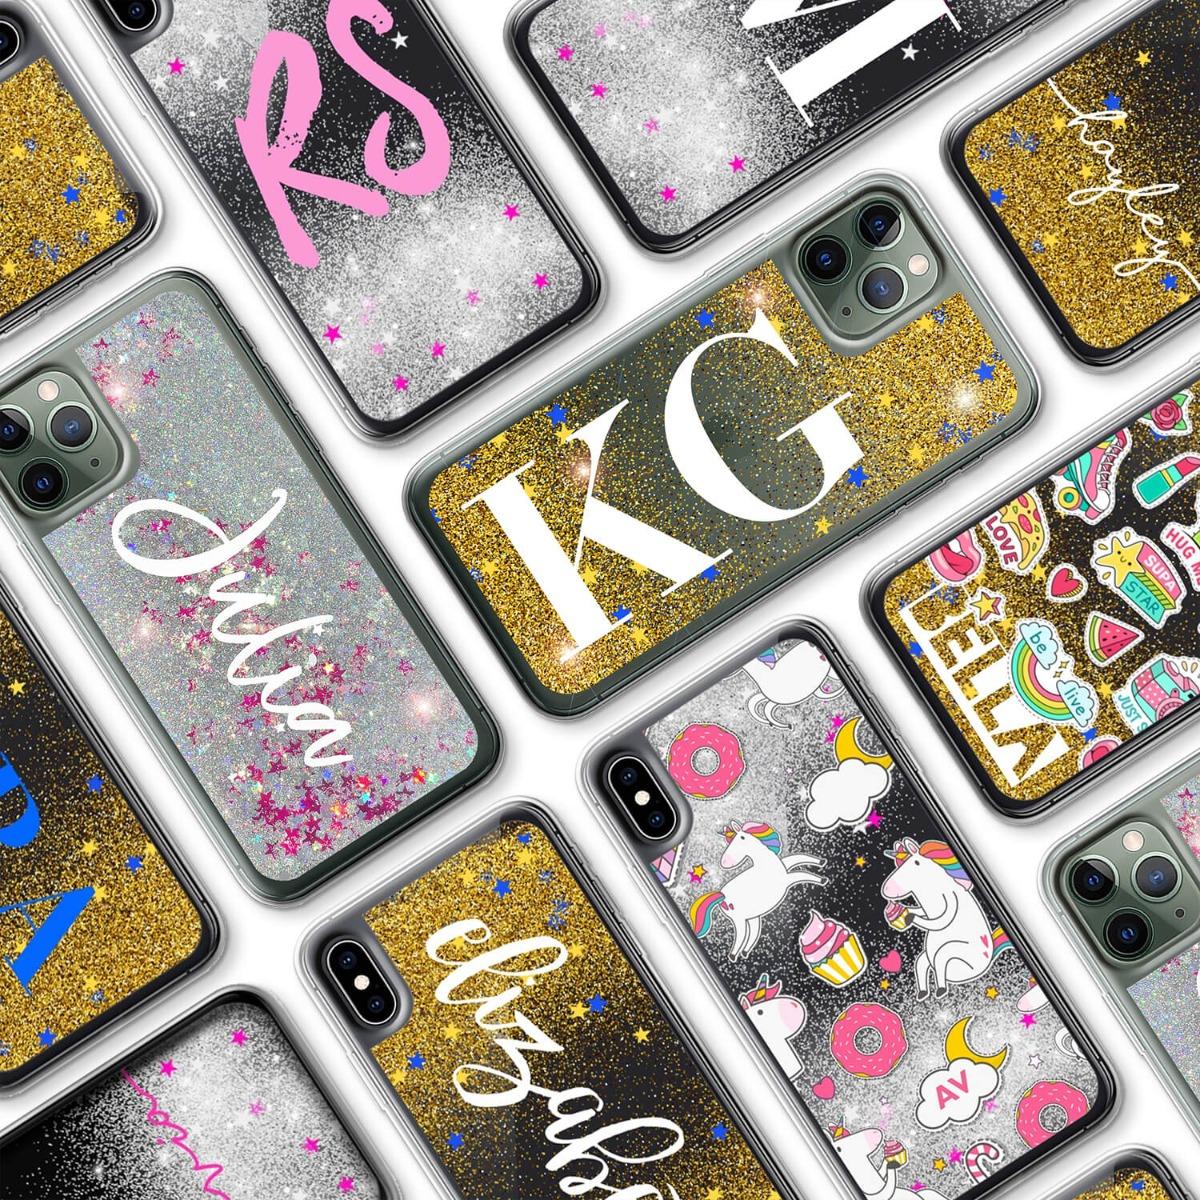 Galaxy S9 Plus Glitter Case 16247